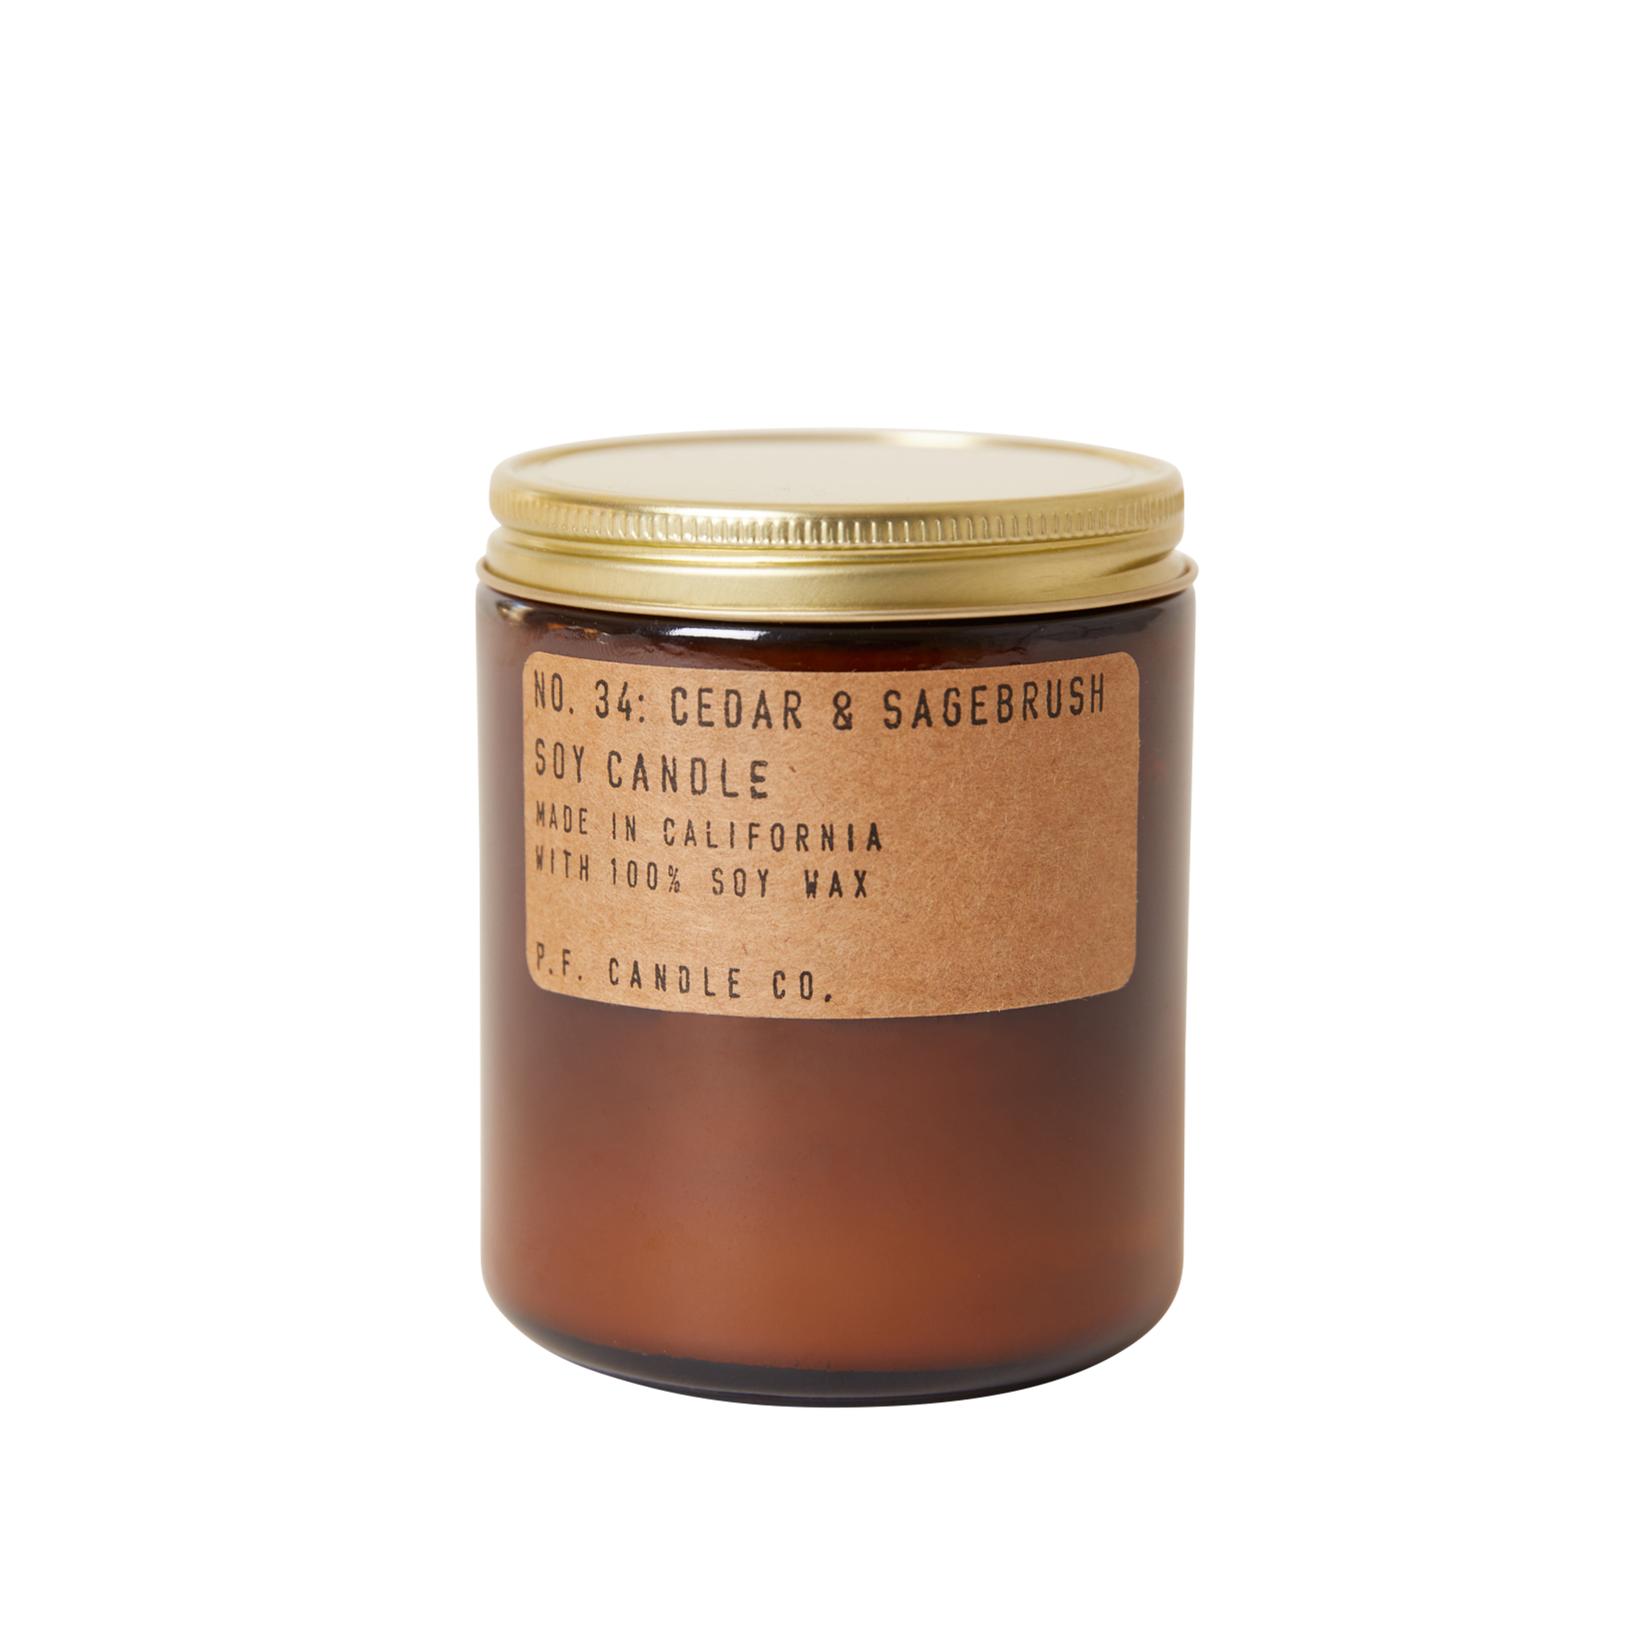 P.F. Candle Co. P.F. Soy Candle 7.2oz Cedar & Sagebrush